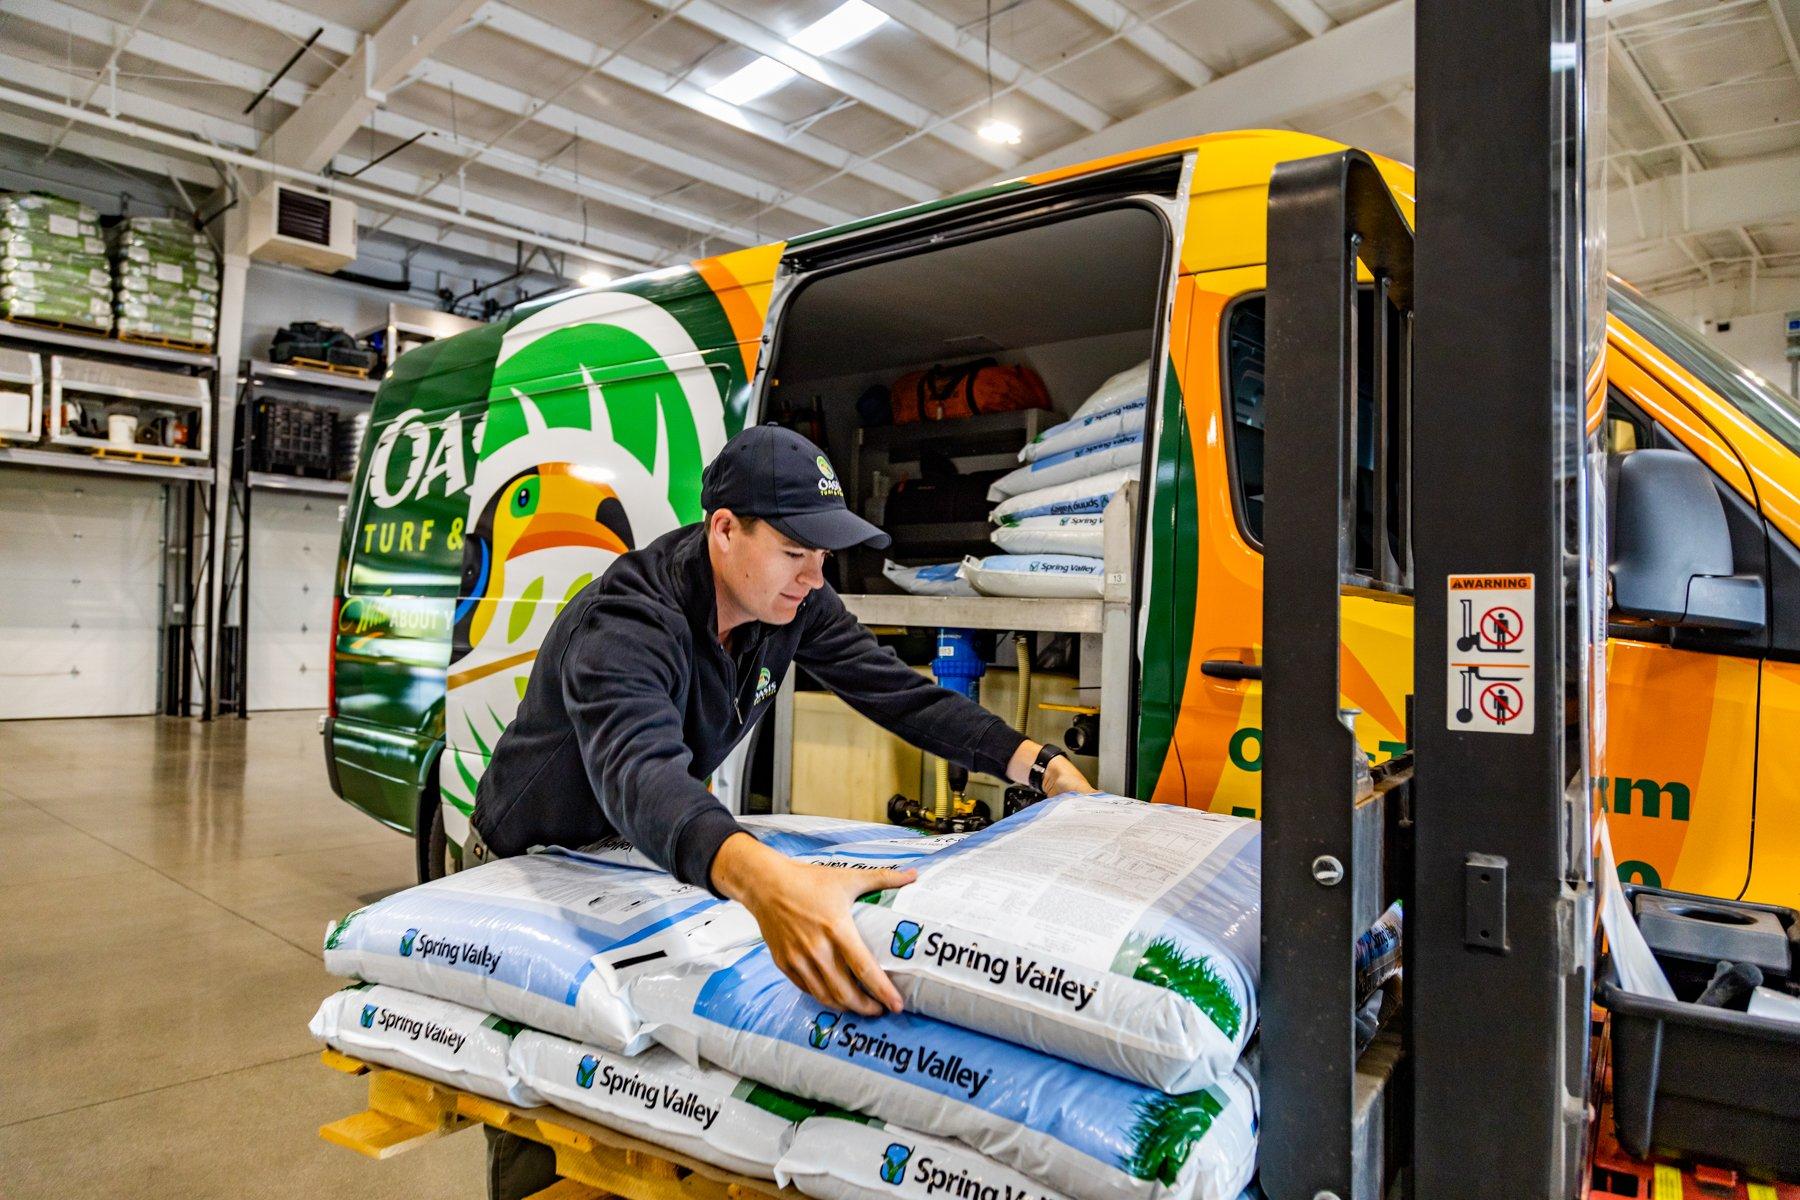 Oasis crew using forklift to load fertilizer into van